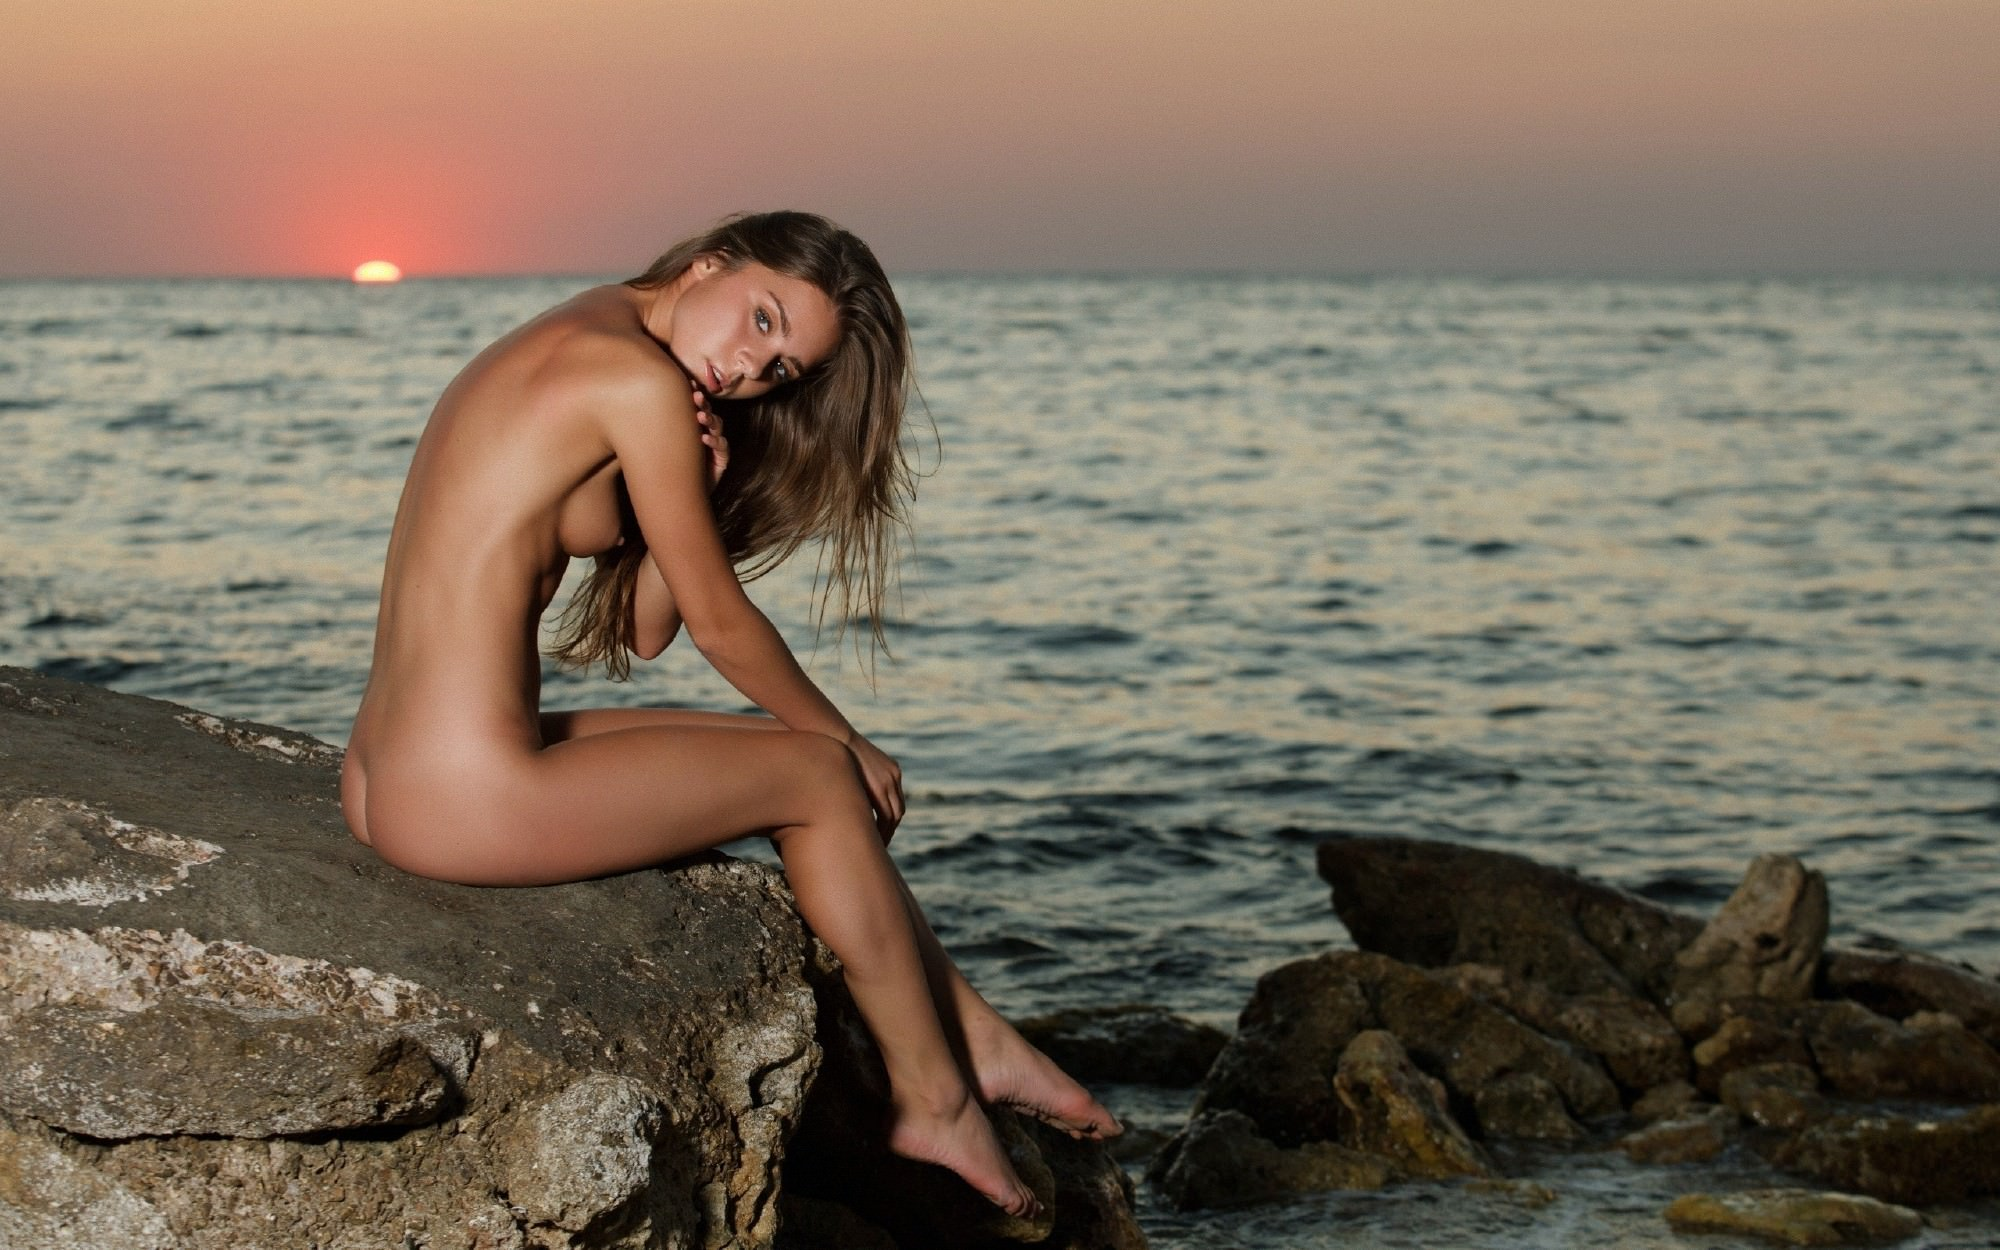 Фото эротических девчонок на закате 10 фотография